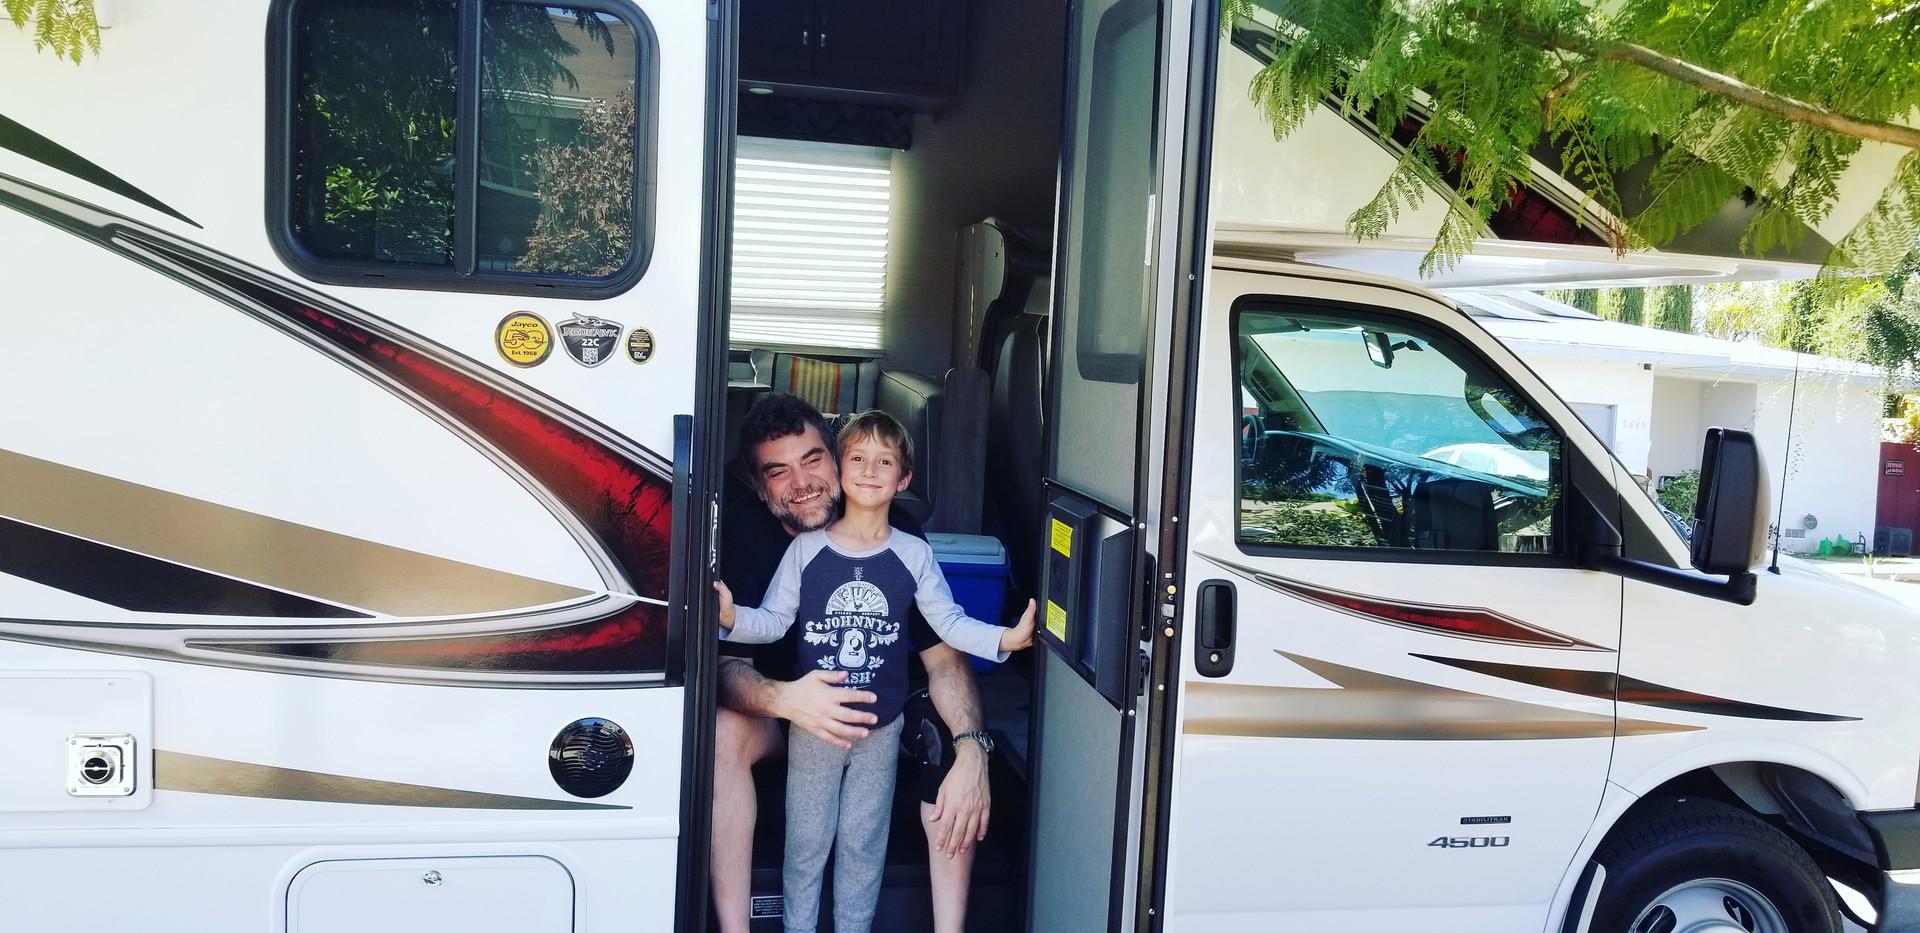 RV Rental Jayco Redhawk Family Trip